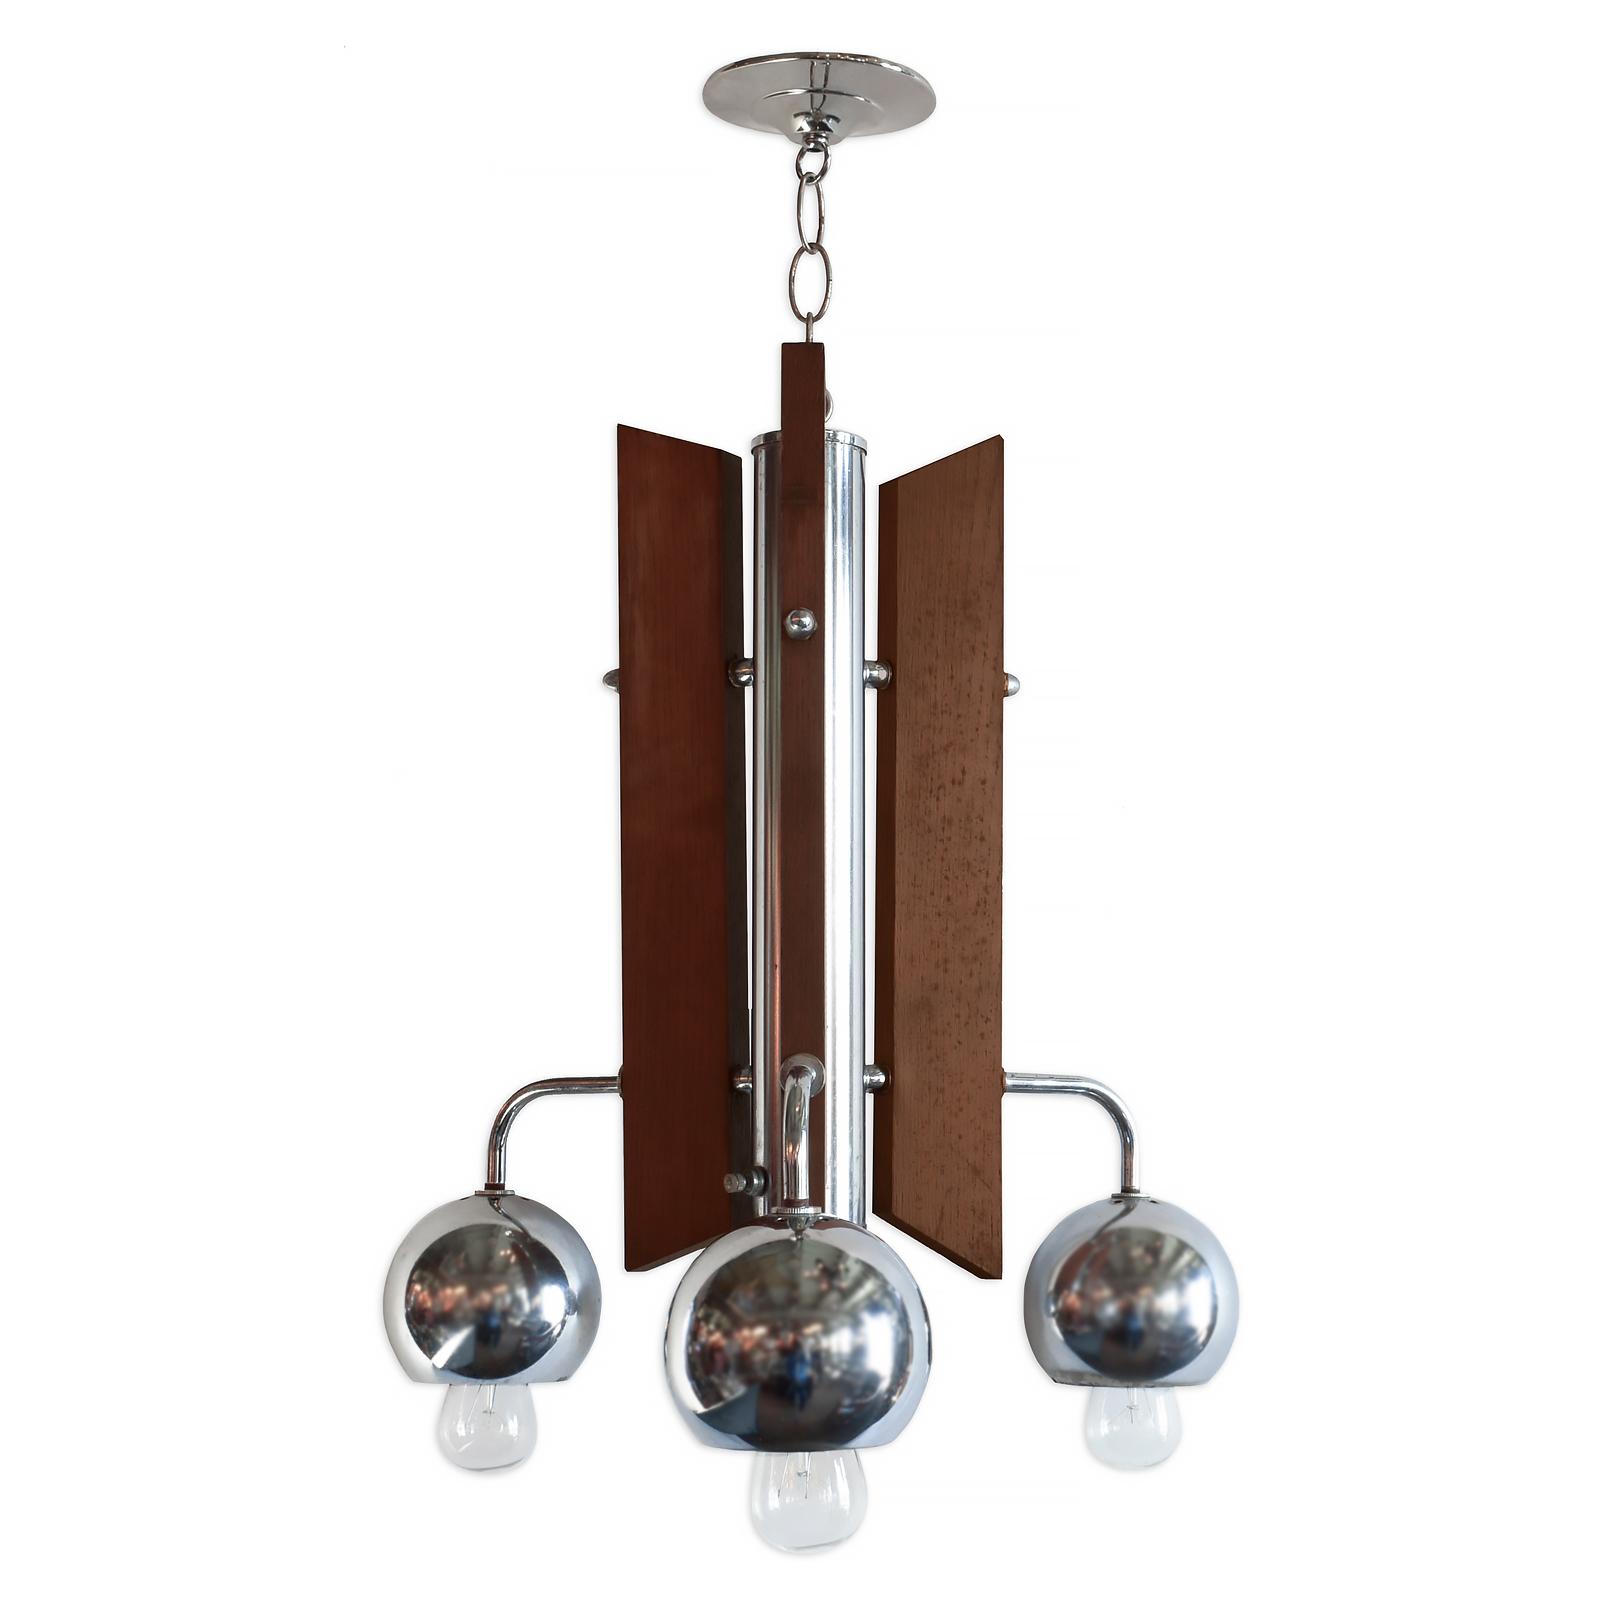 45438-wood-midcentury-three-light-chandelier-angle-2.jpg